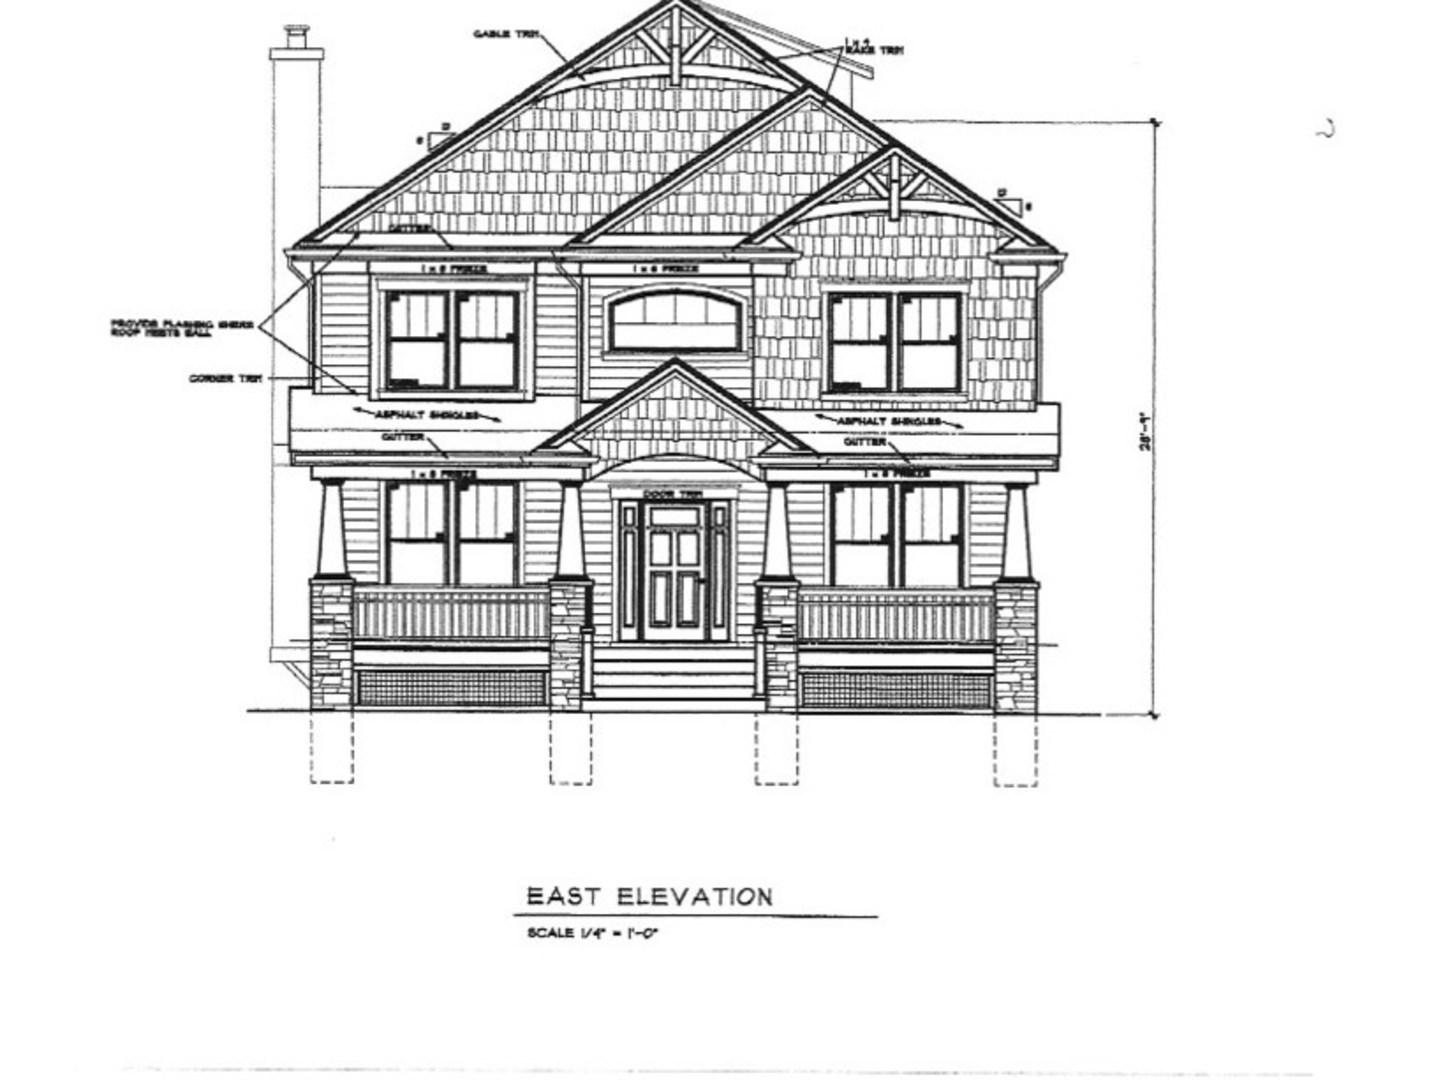 809 Home Avenue, Oak Park, Illinois